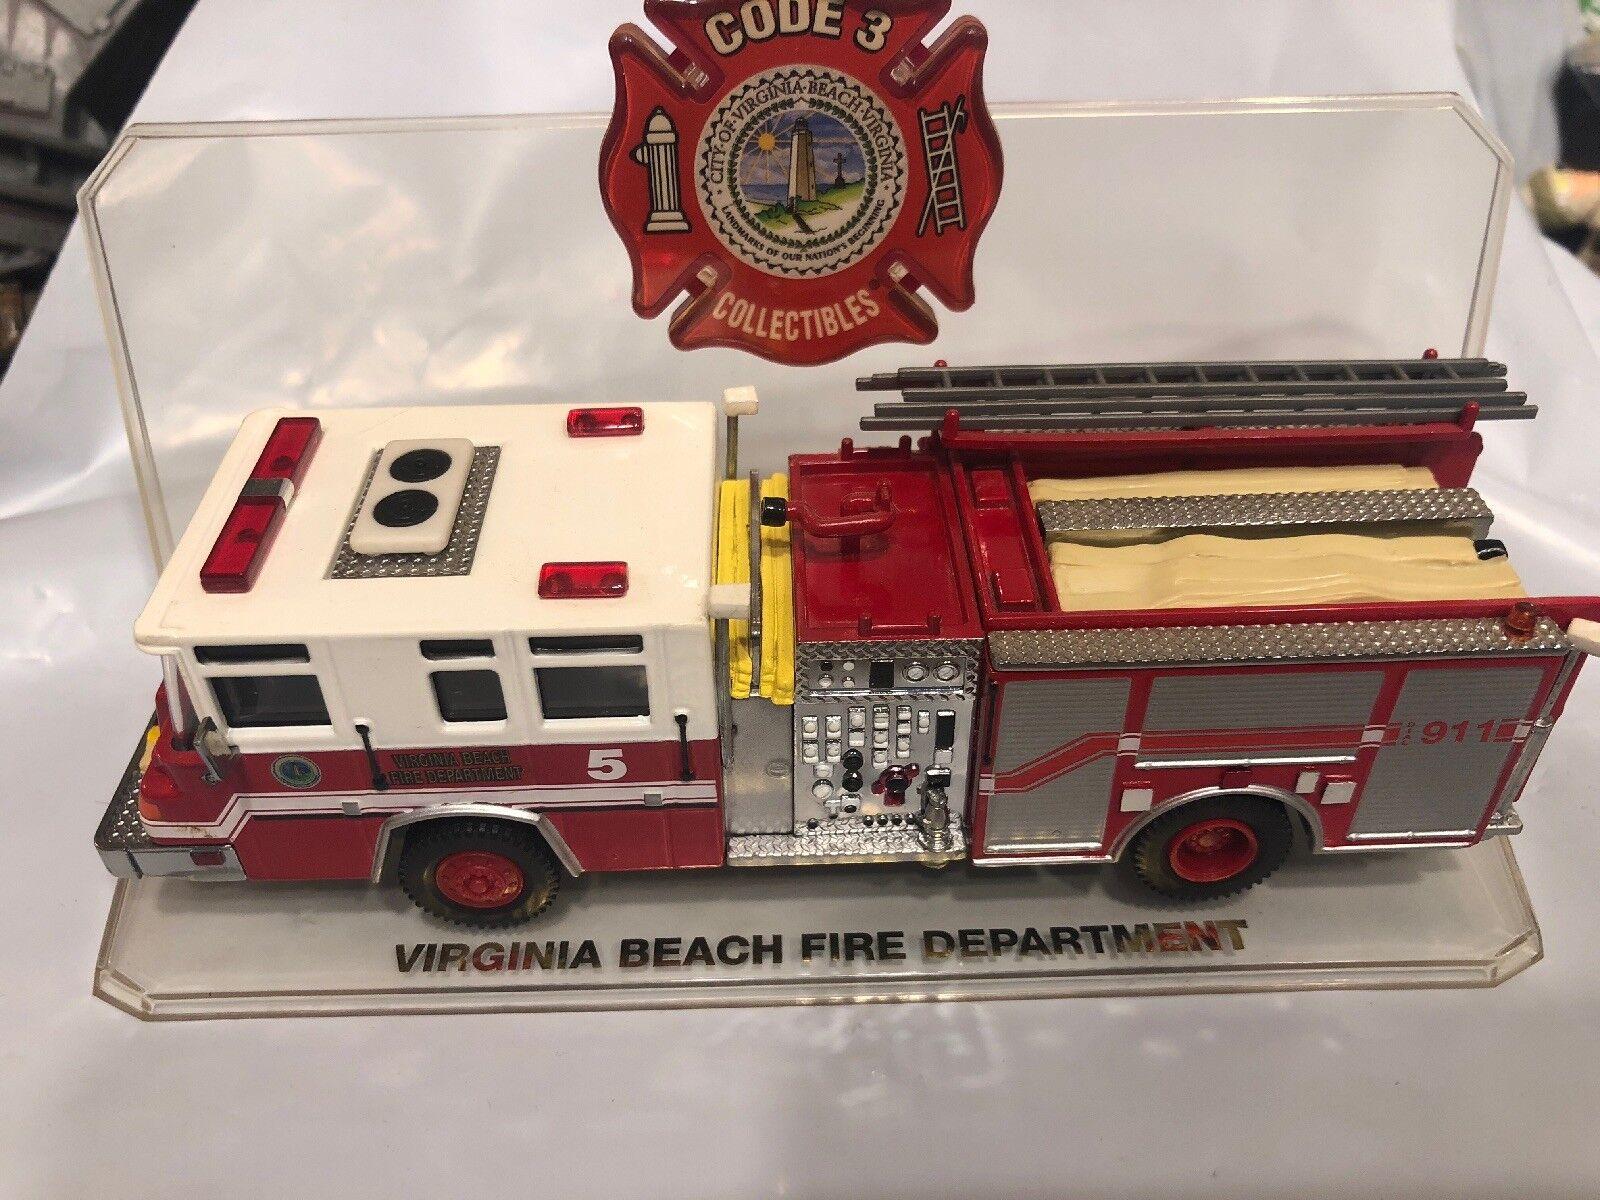 CODE 3 VIRGINIA BEACH FIRE DEPARTSieT ENGINE 5